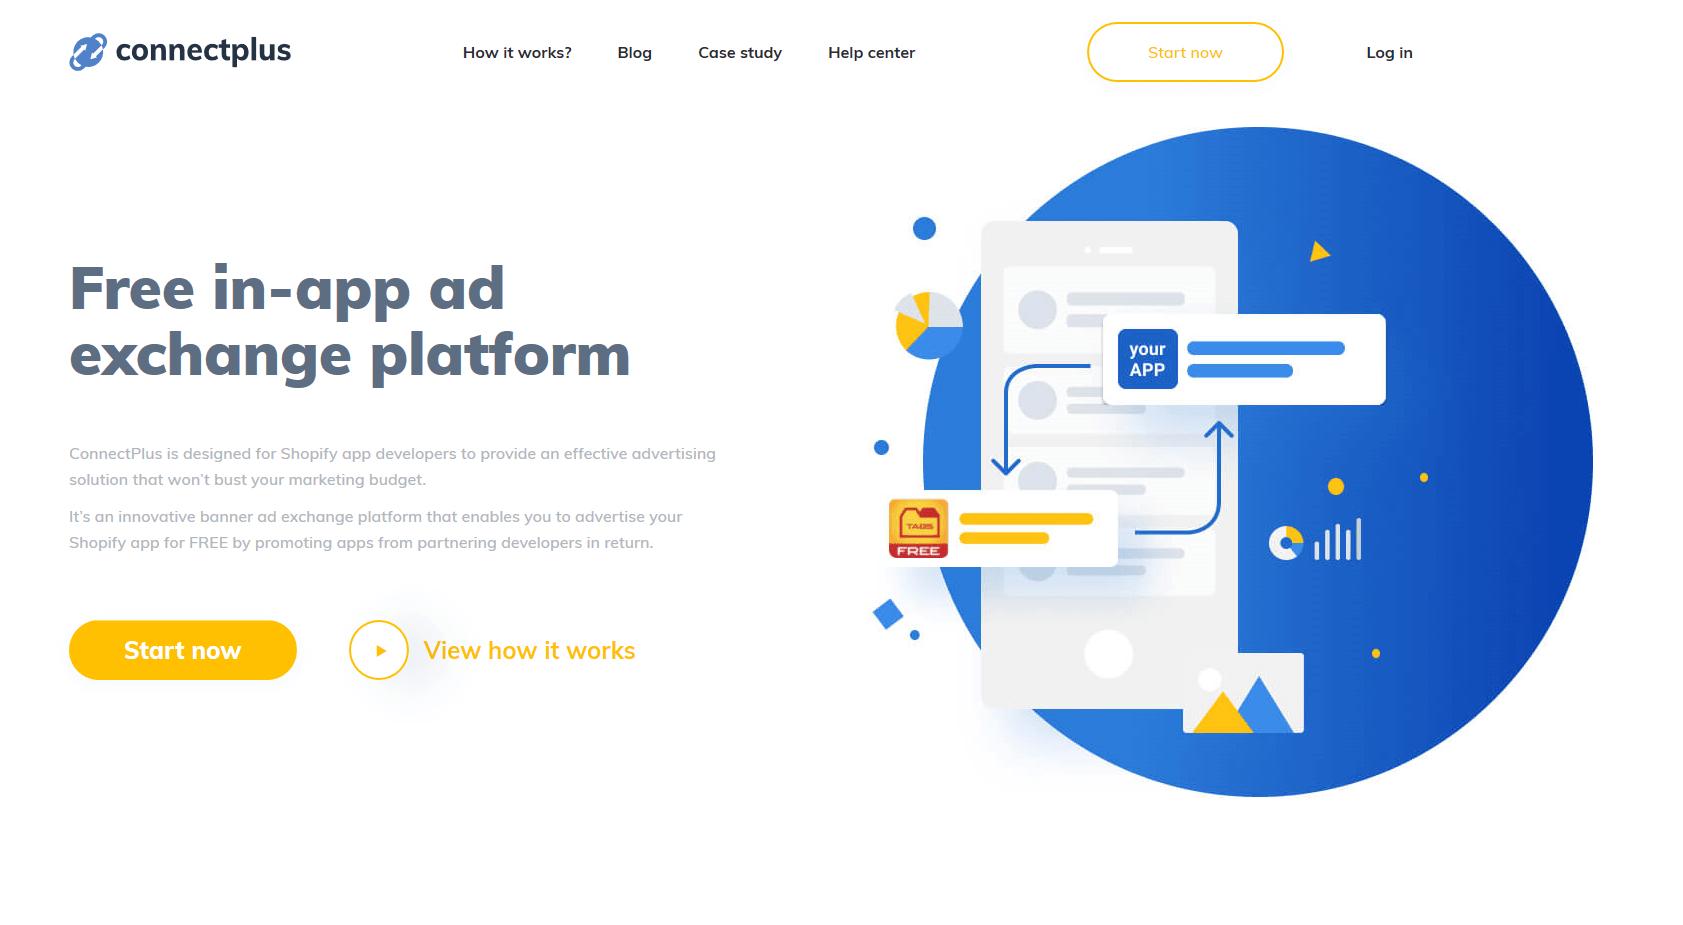 ConnectPlus website